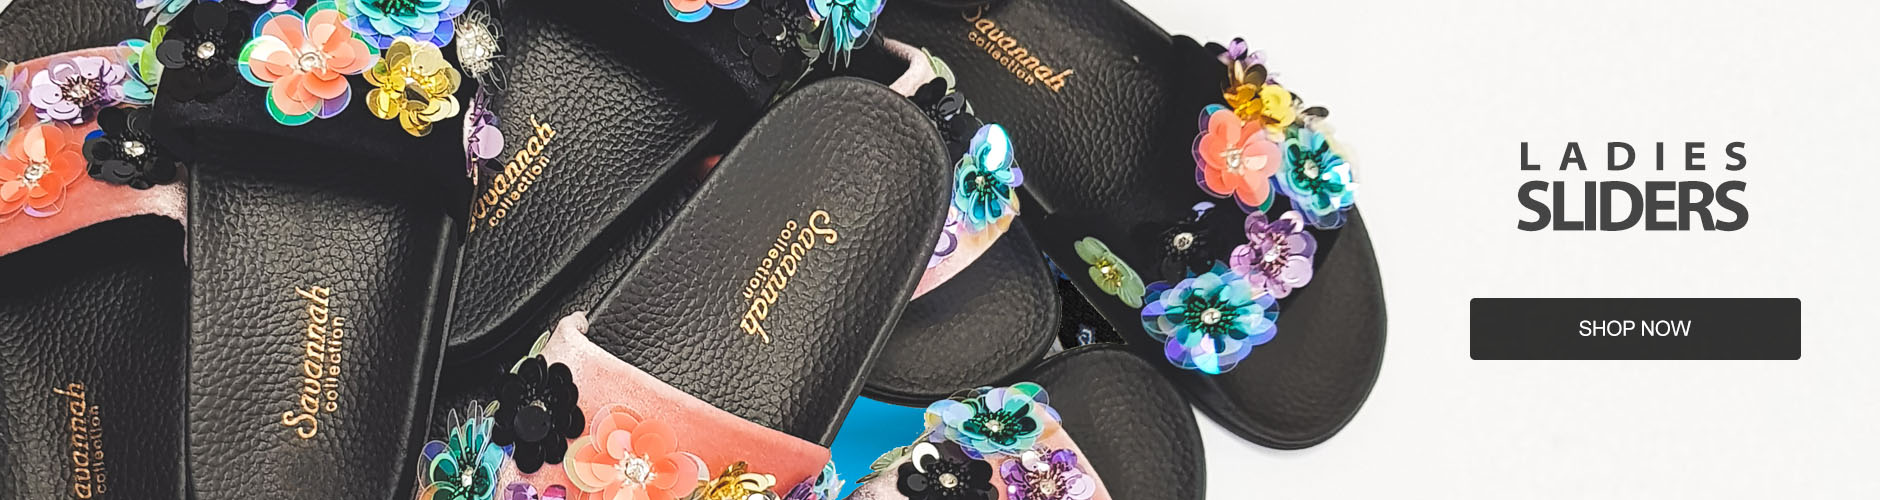 Ladies Sliders and Sandals